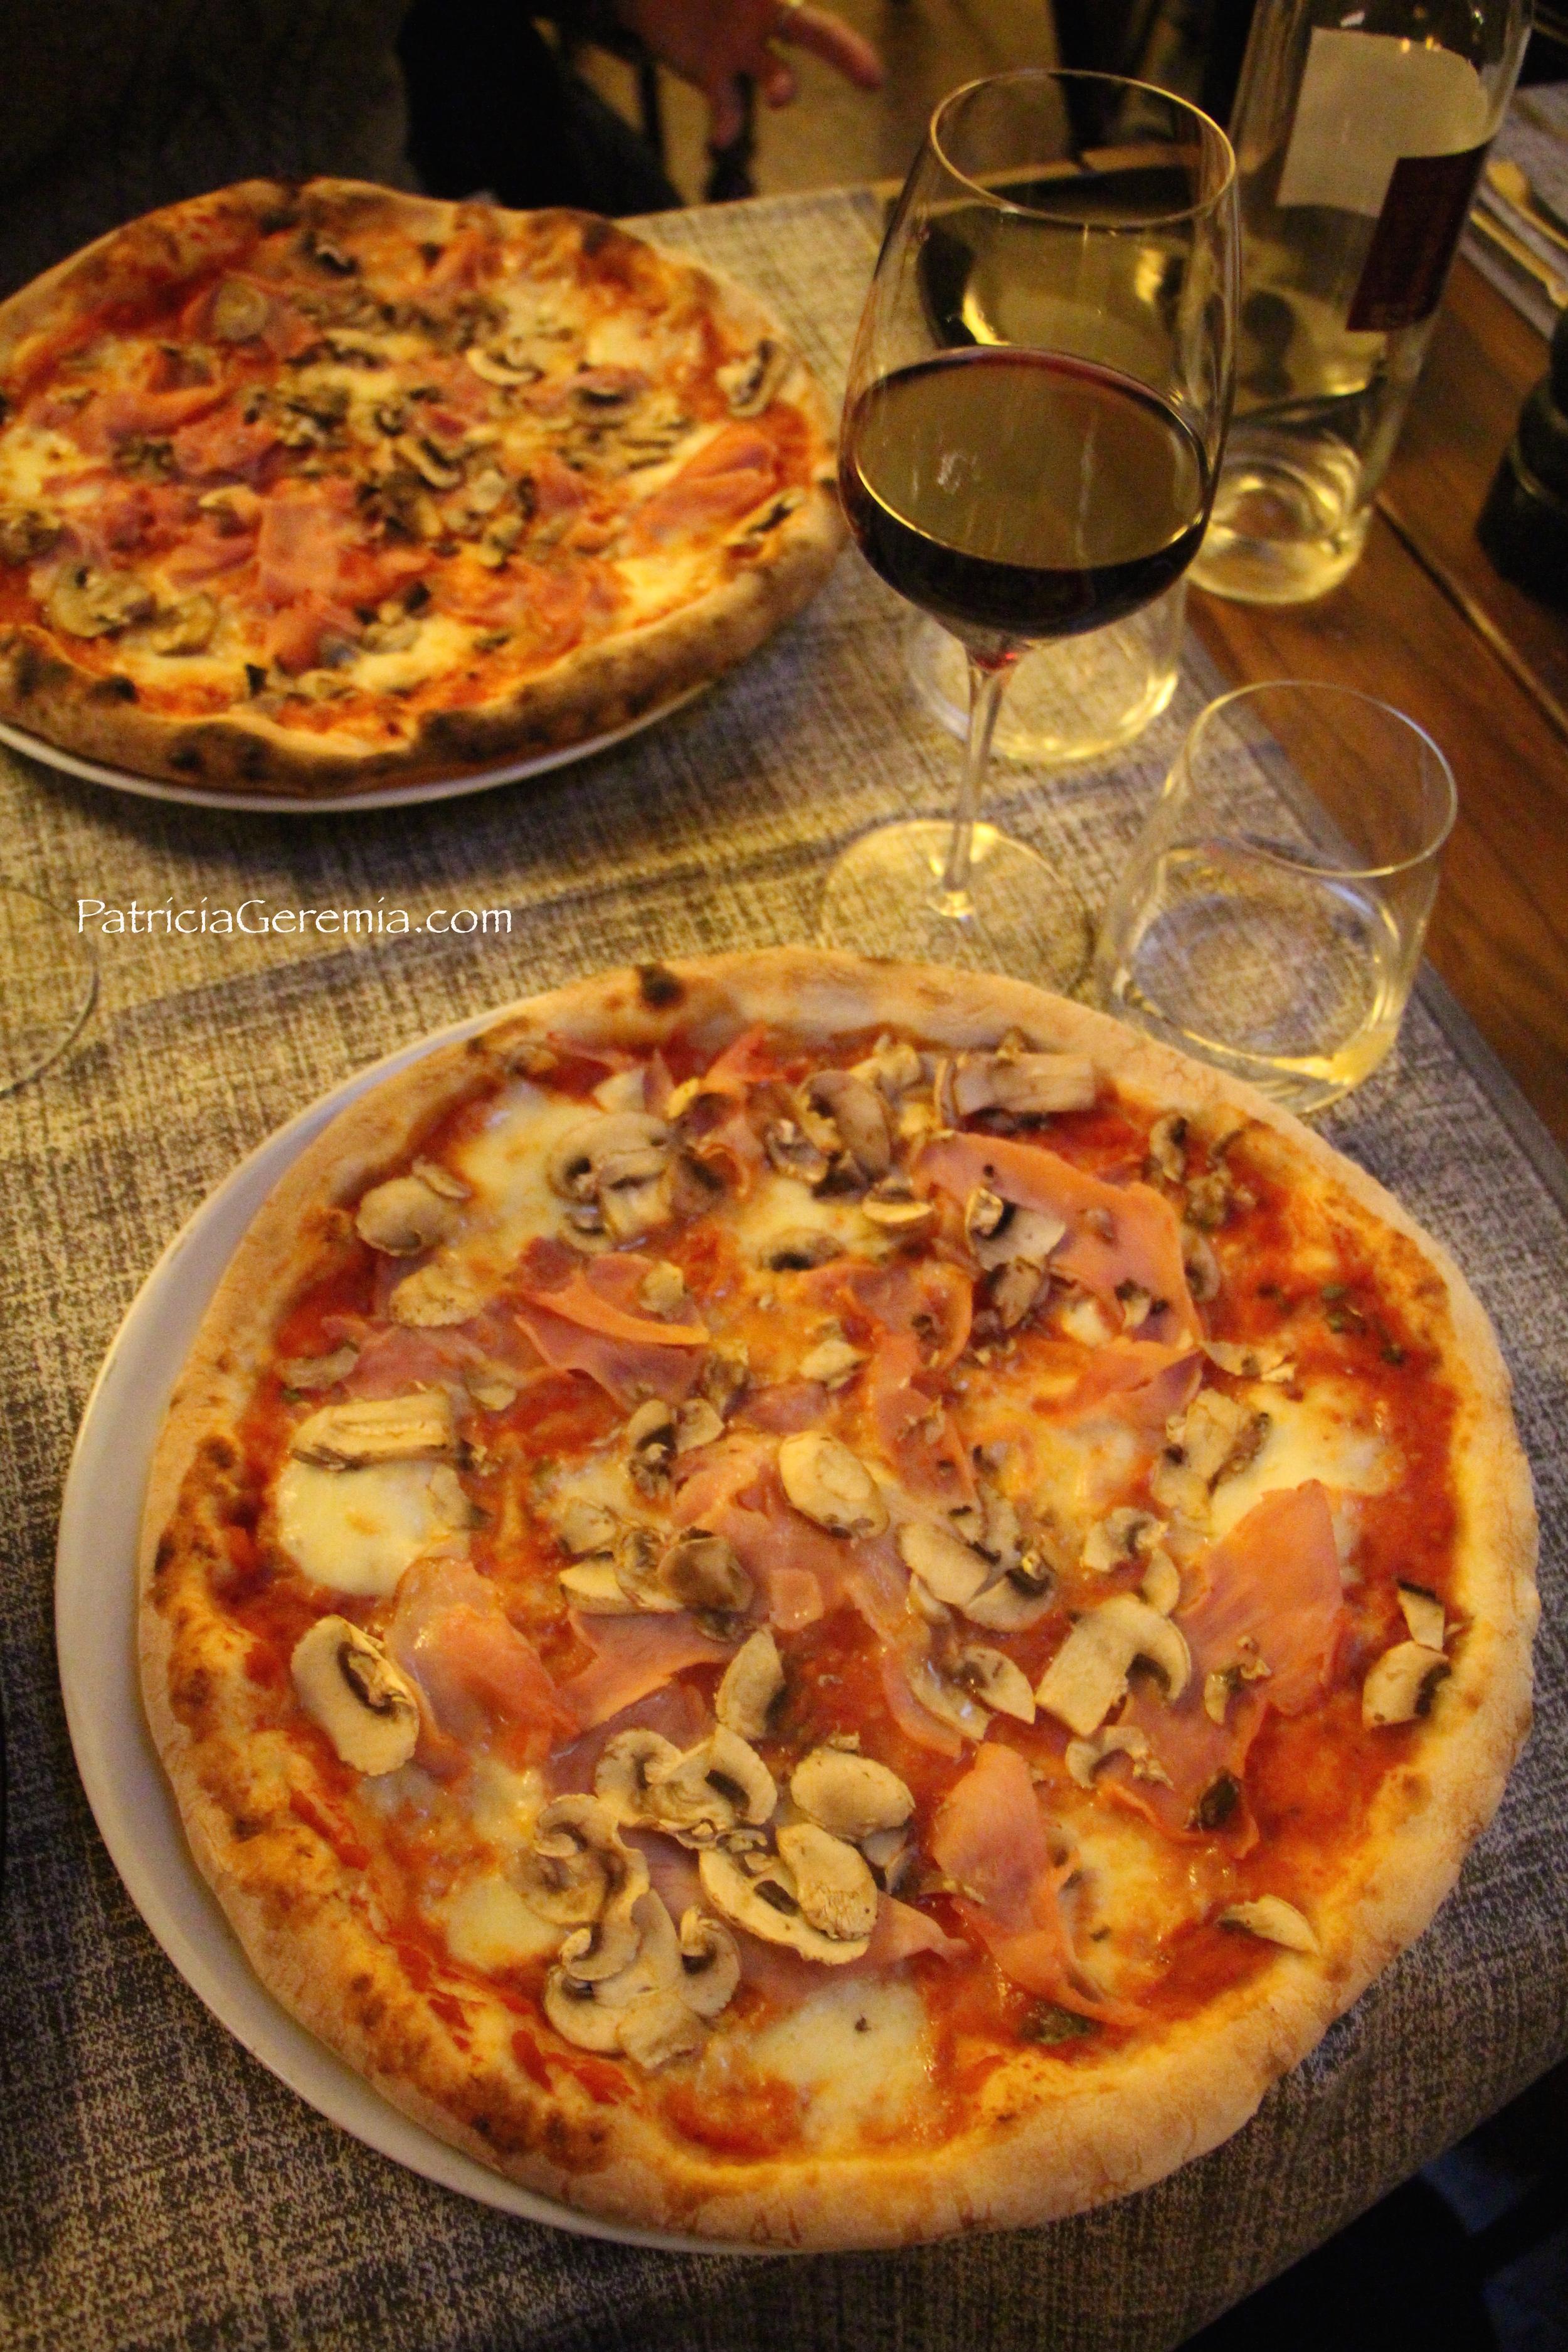 Pizza at La Bussola wm.jpg